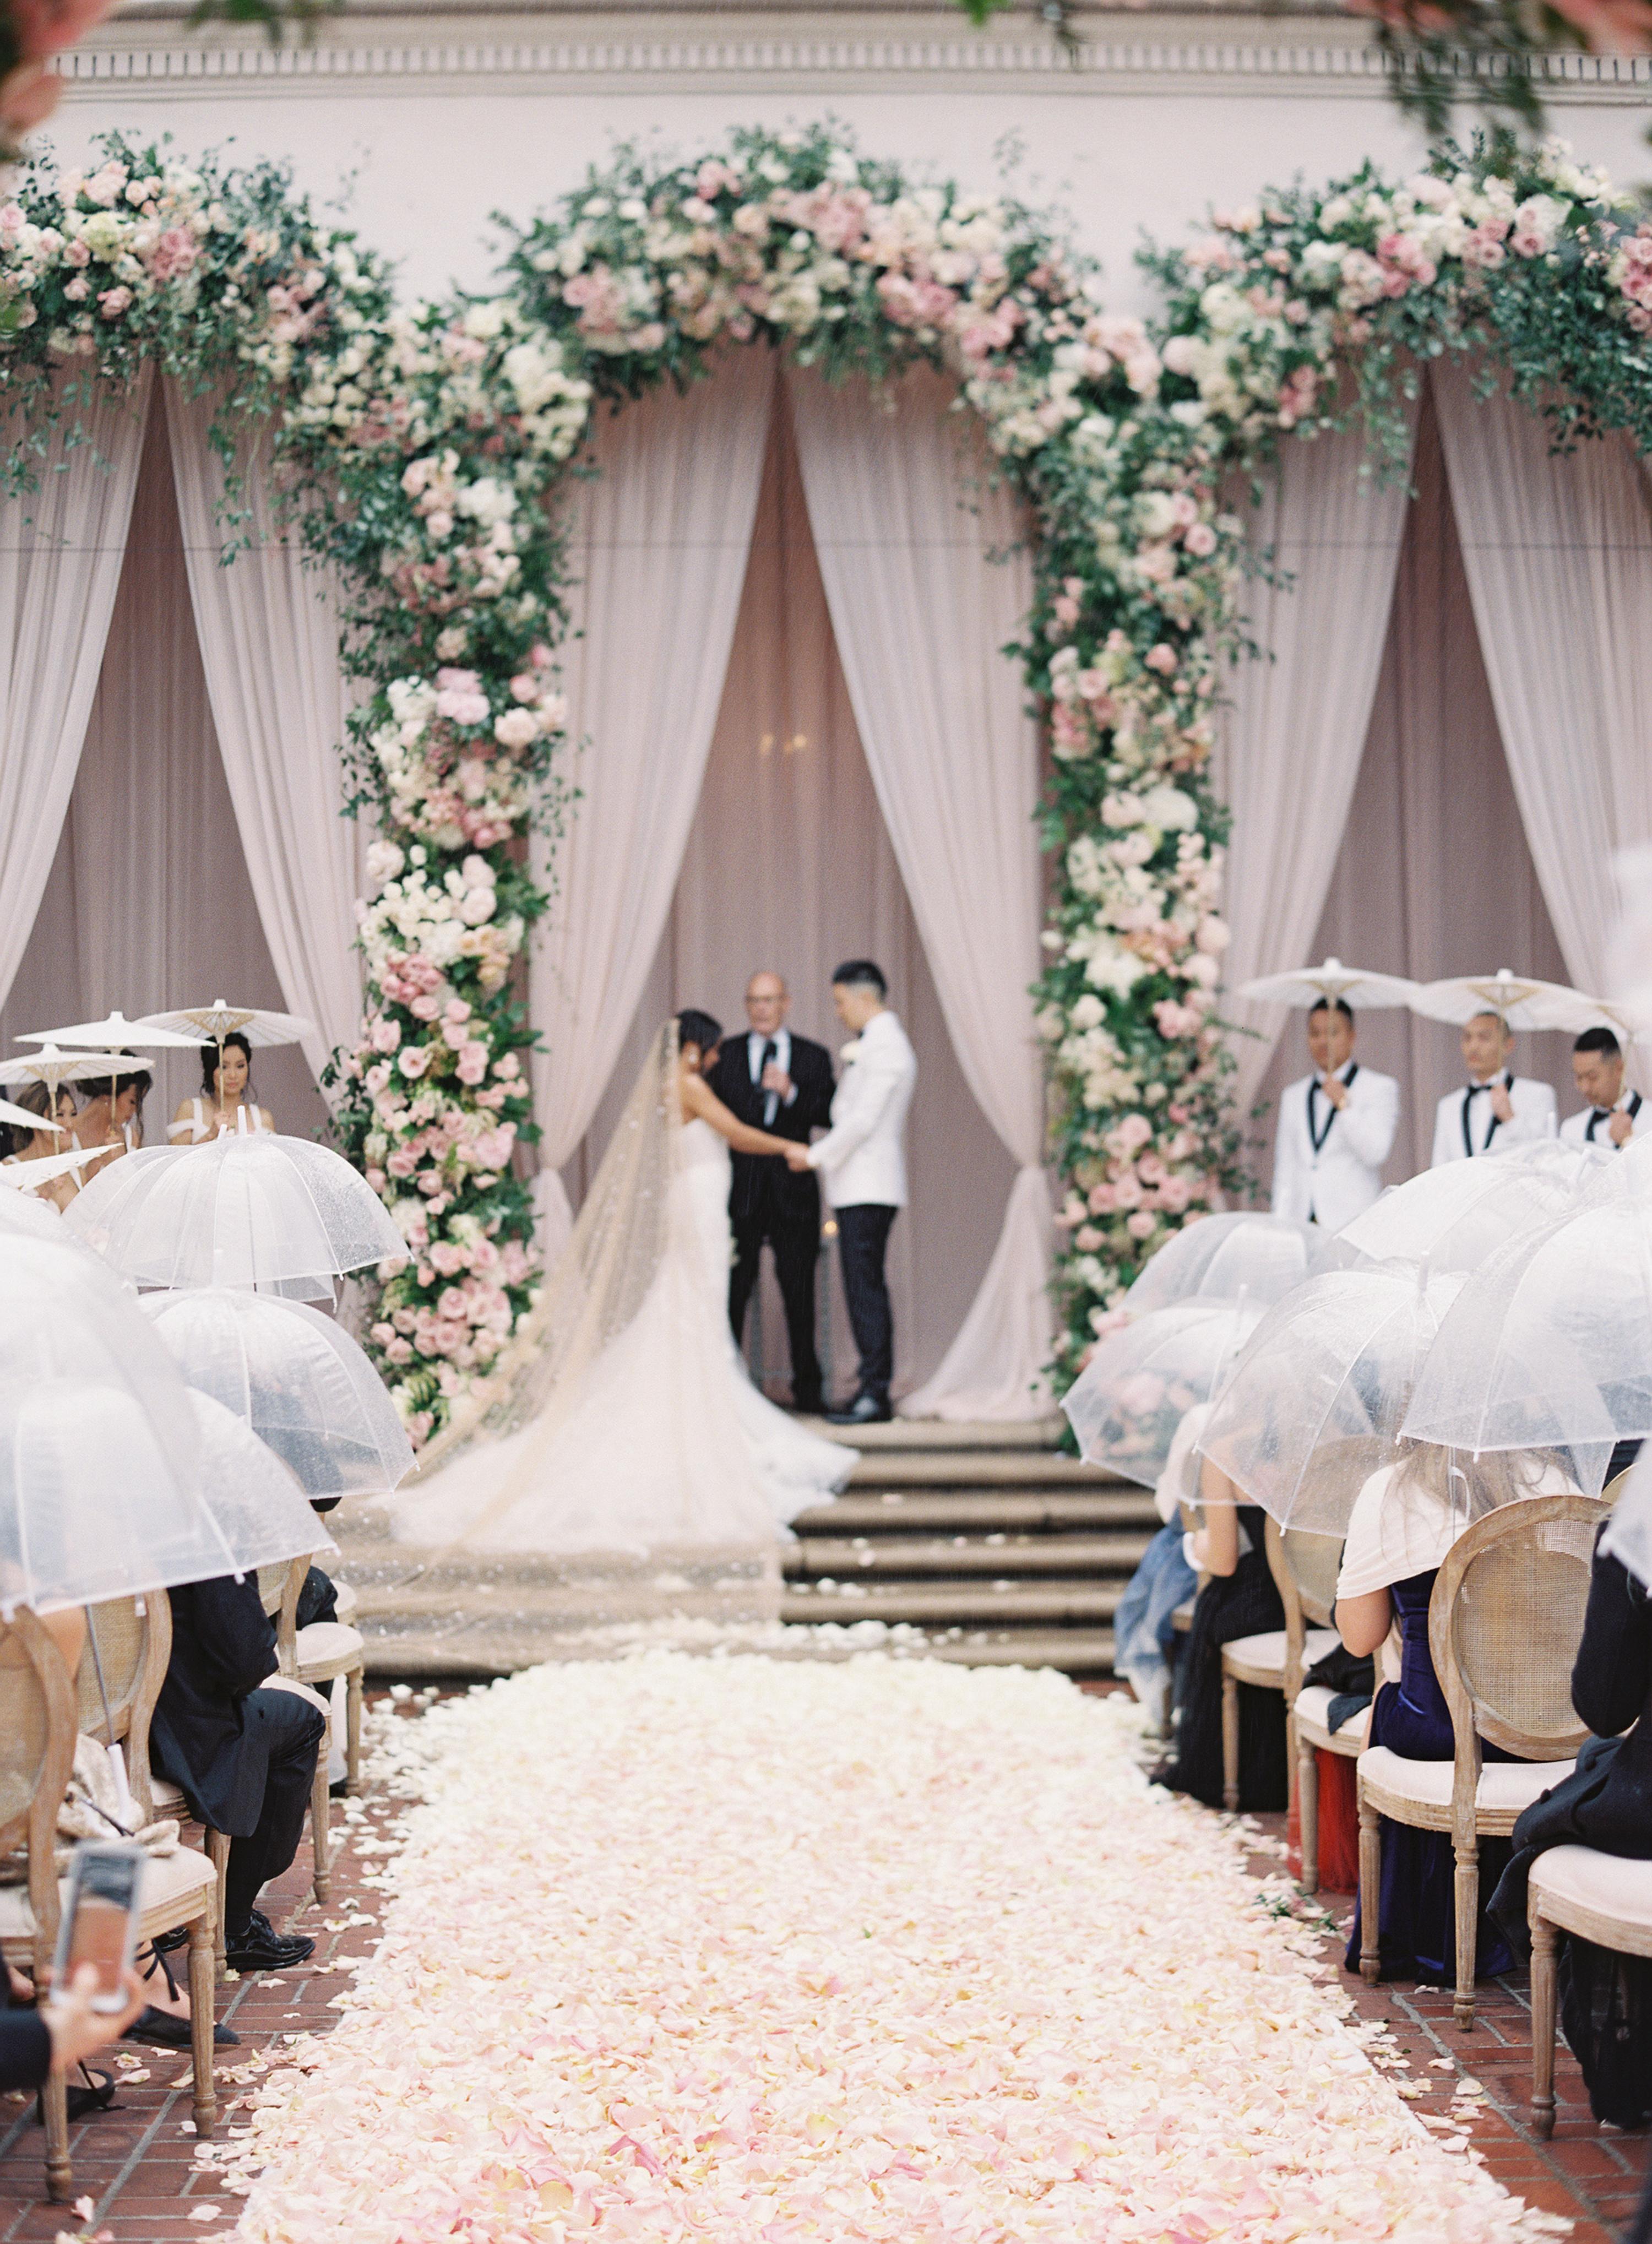 Athenaeum_Wedding_Hi_Res-56-Jen_Huang-005196-R1-014